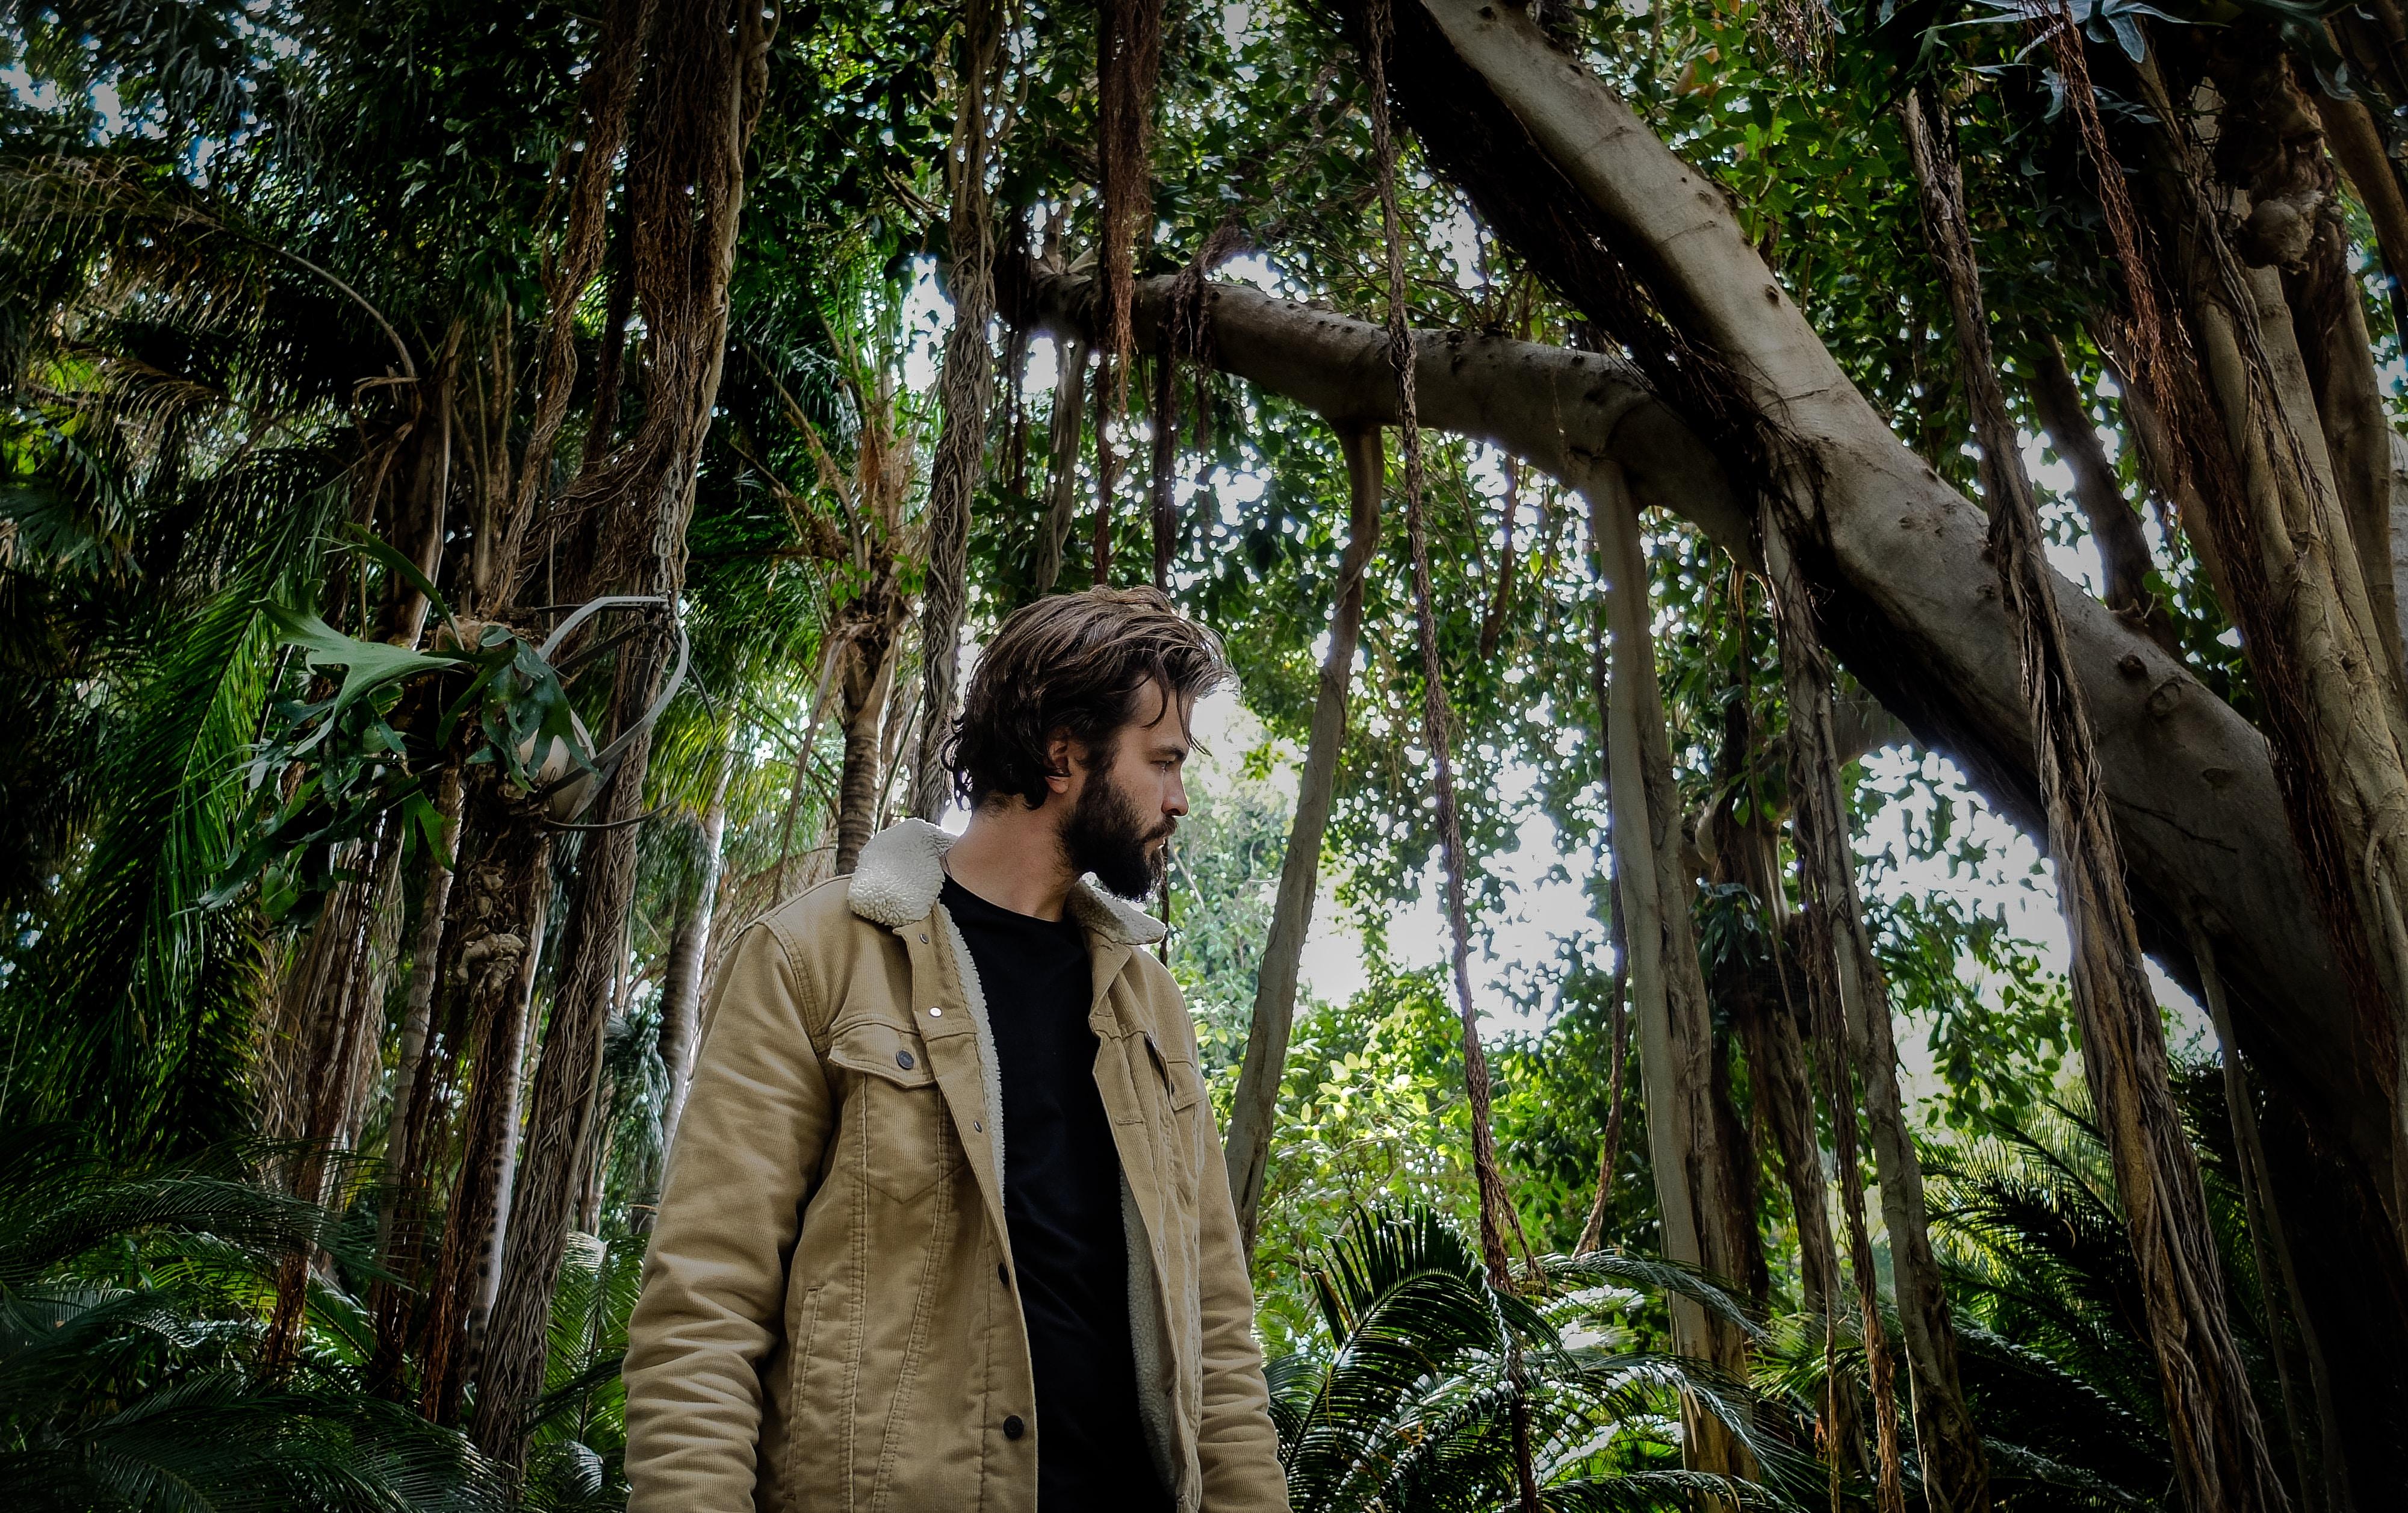 man walking under tree